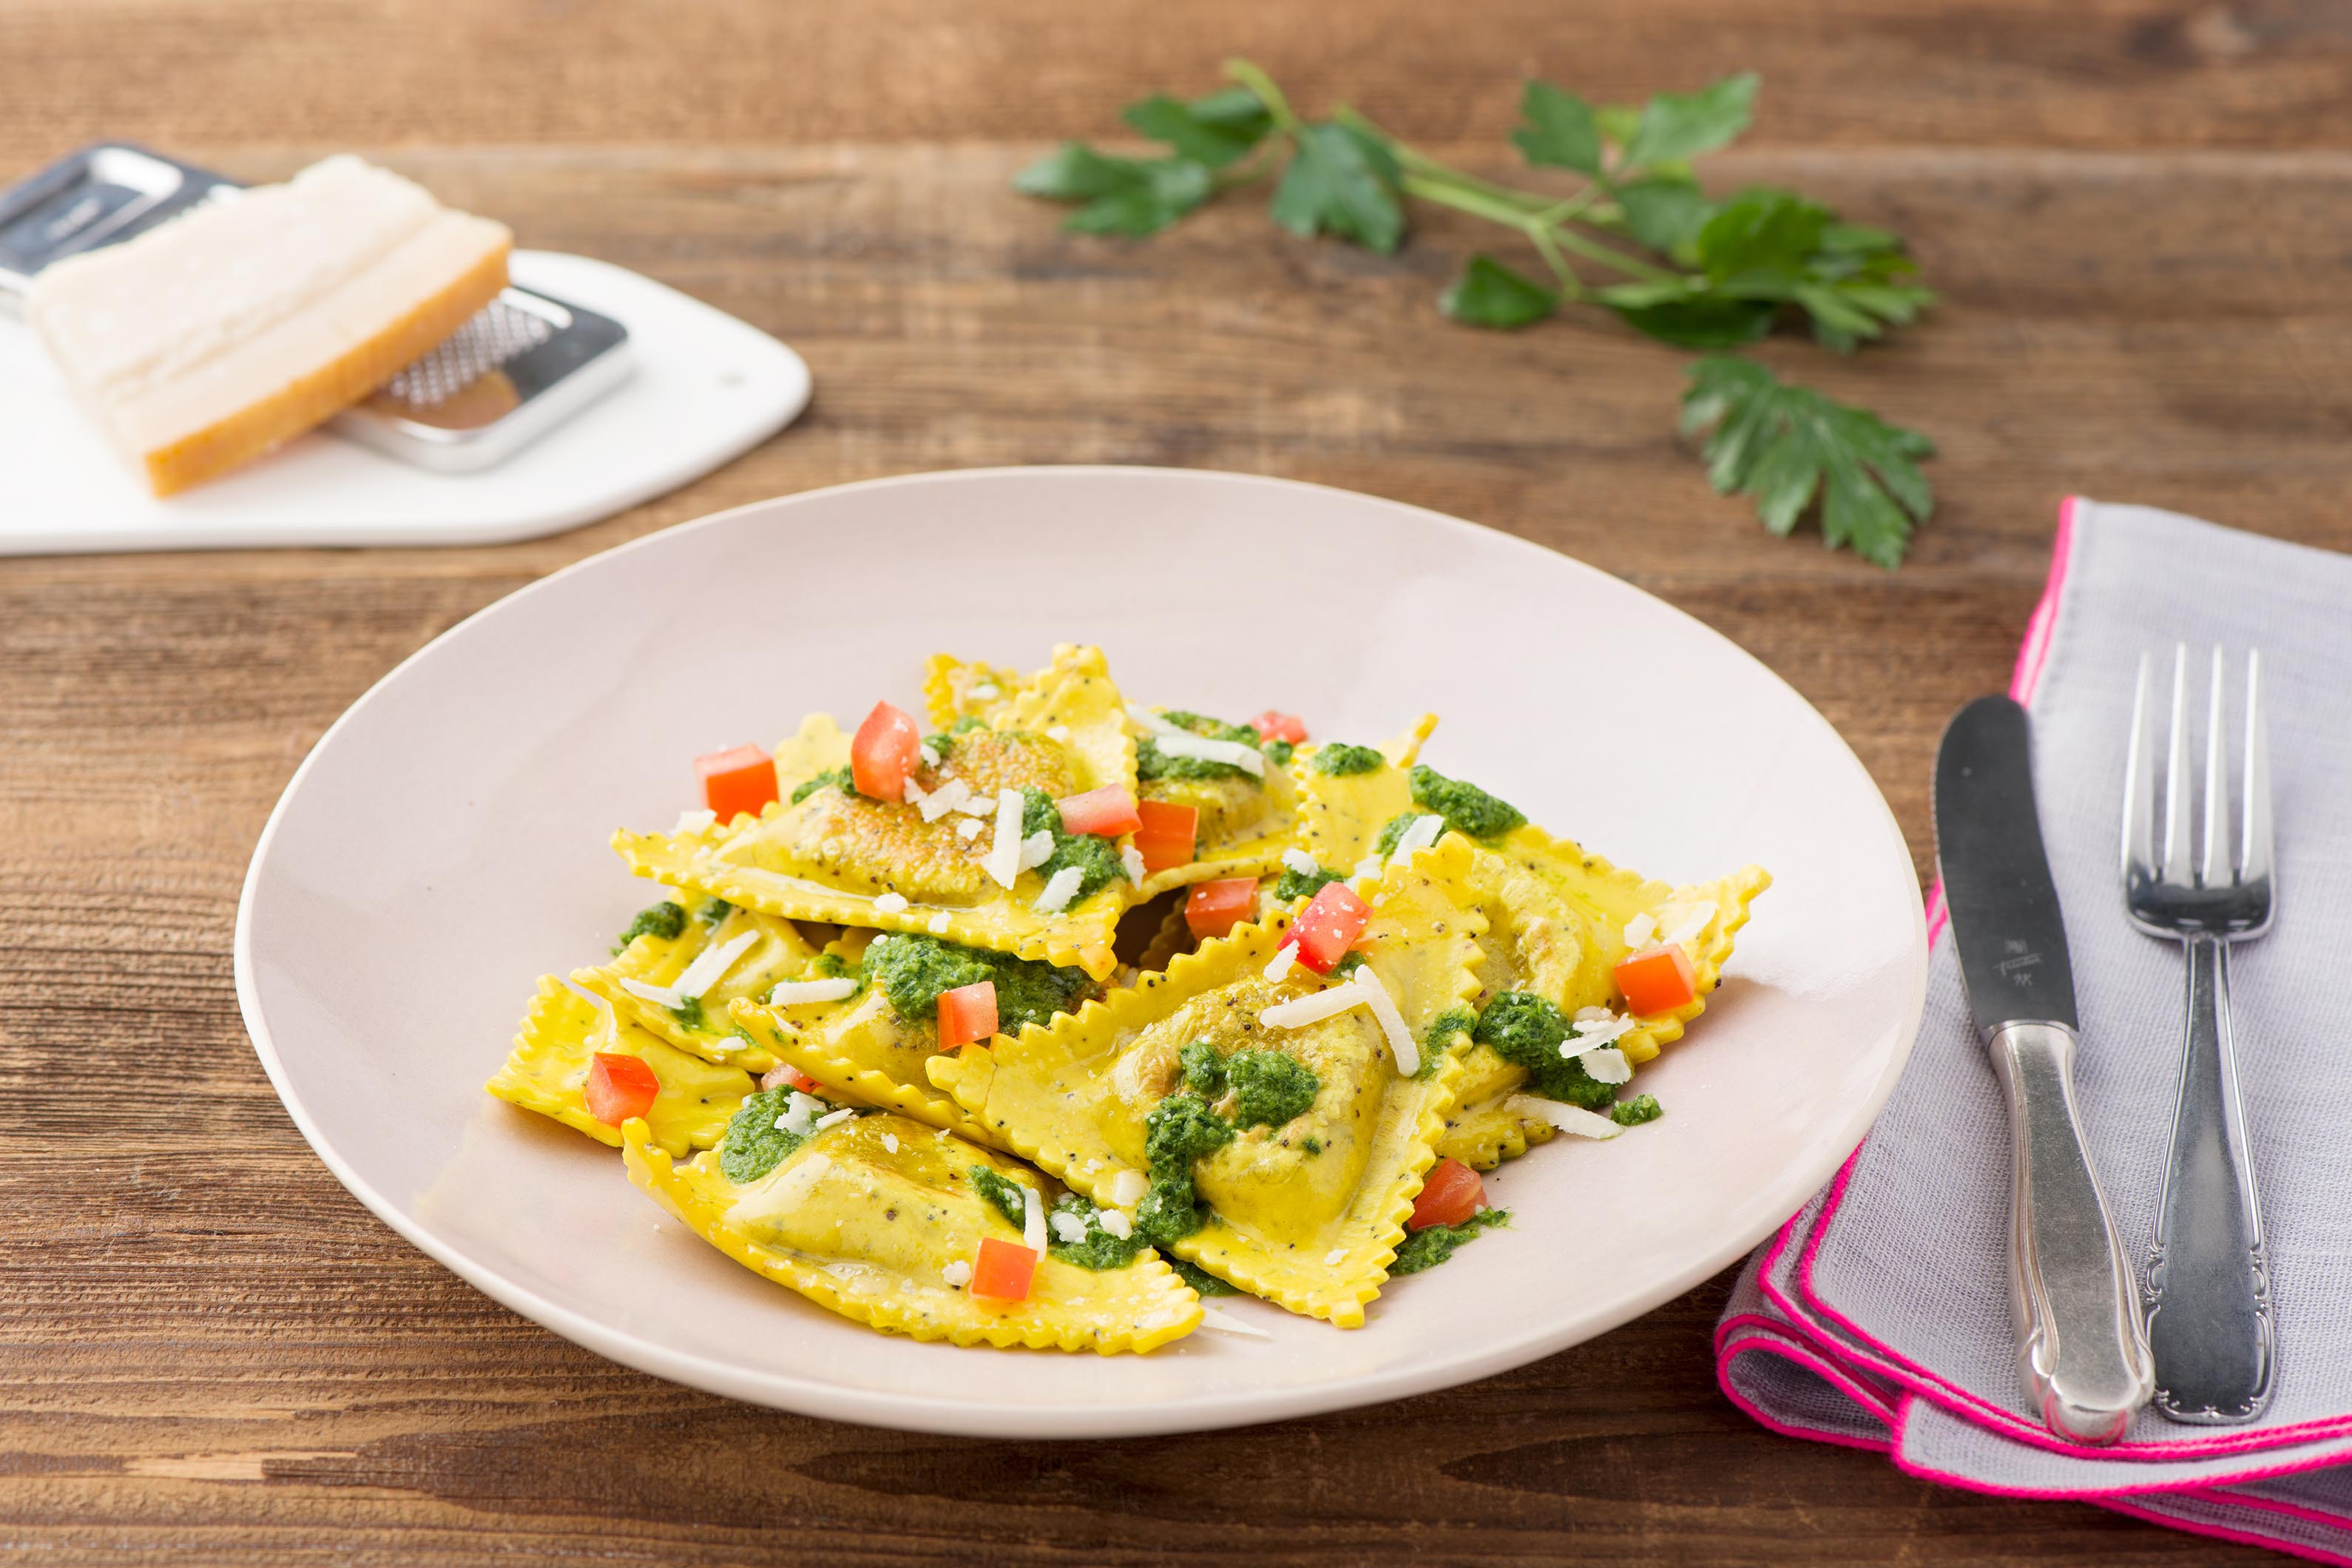 Lecker gefüllte Triangoli mit würziger Chimichurri-Soße Tomatenwürfeln und Parmesan